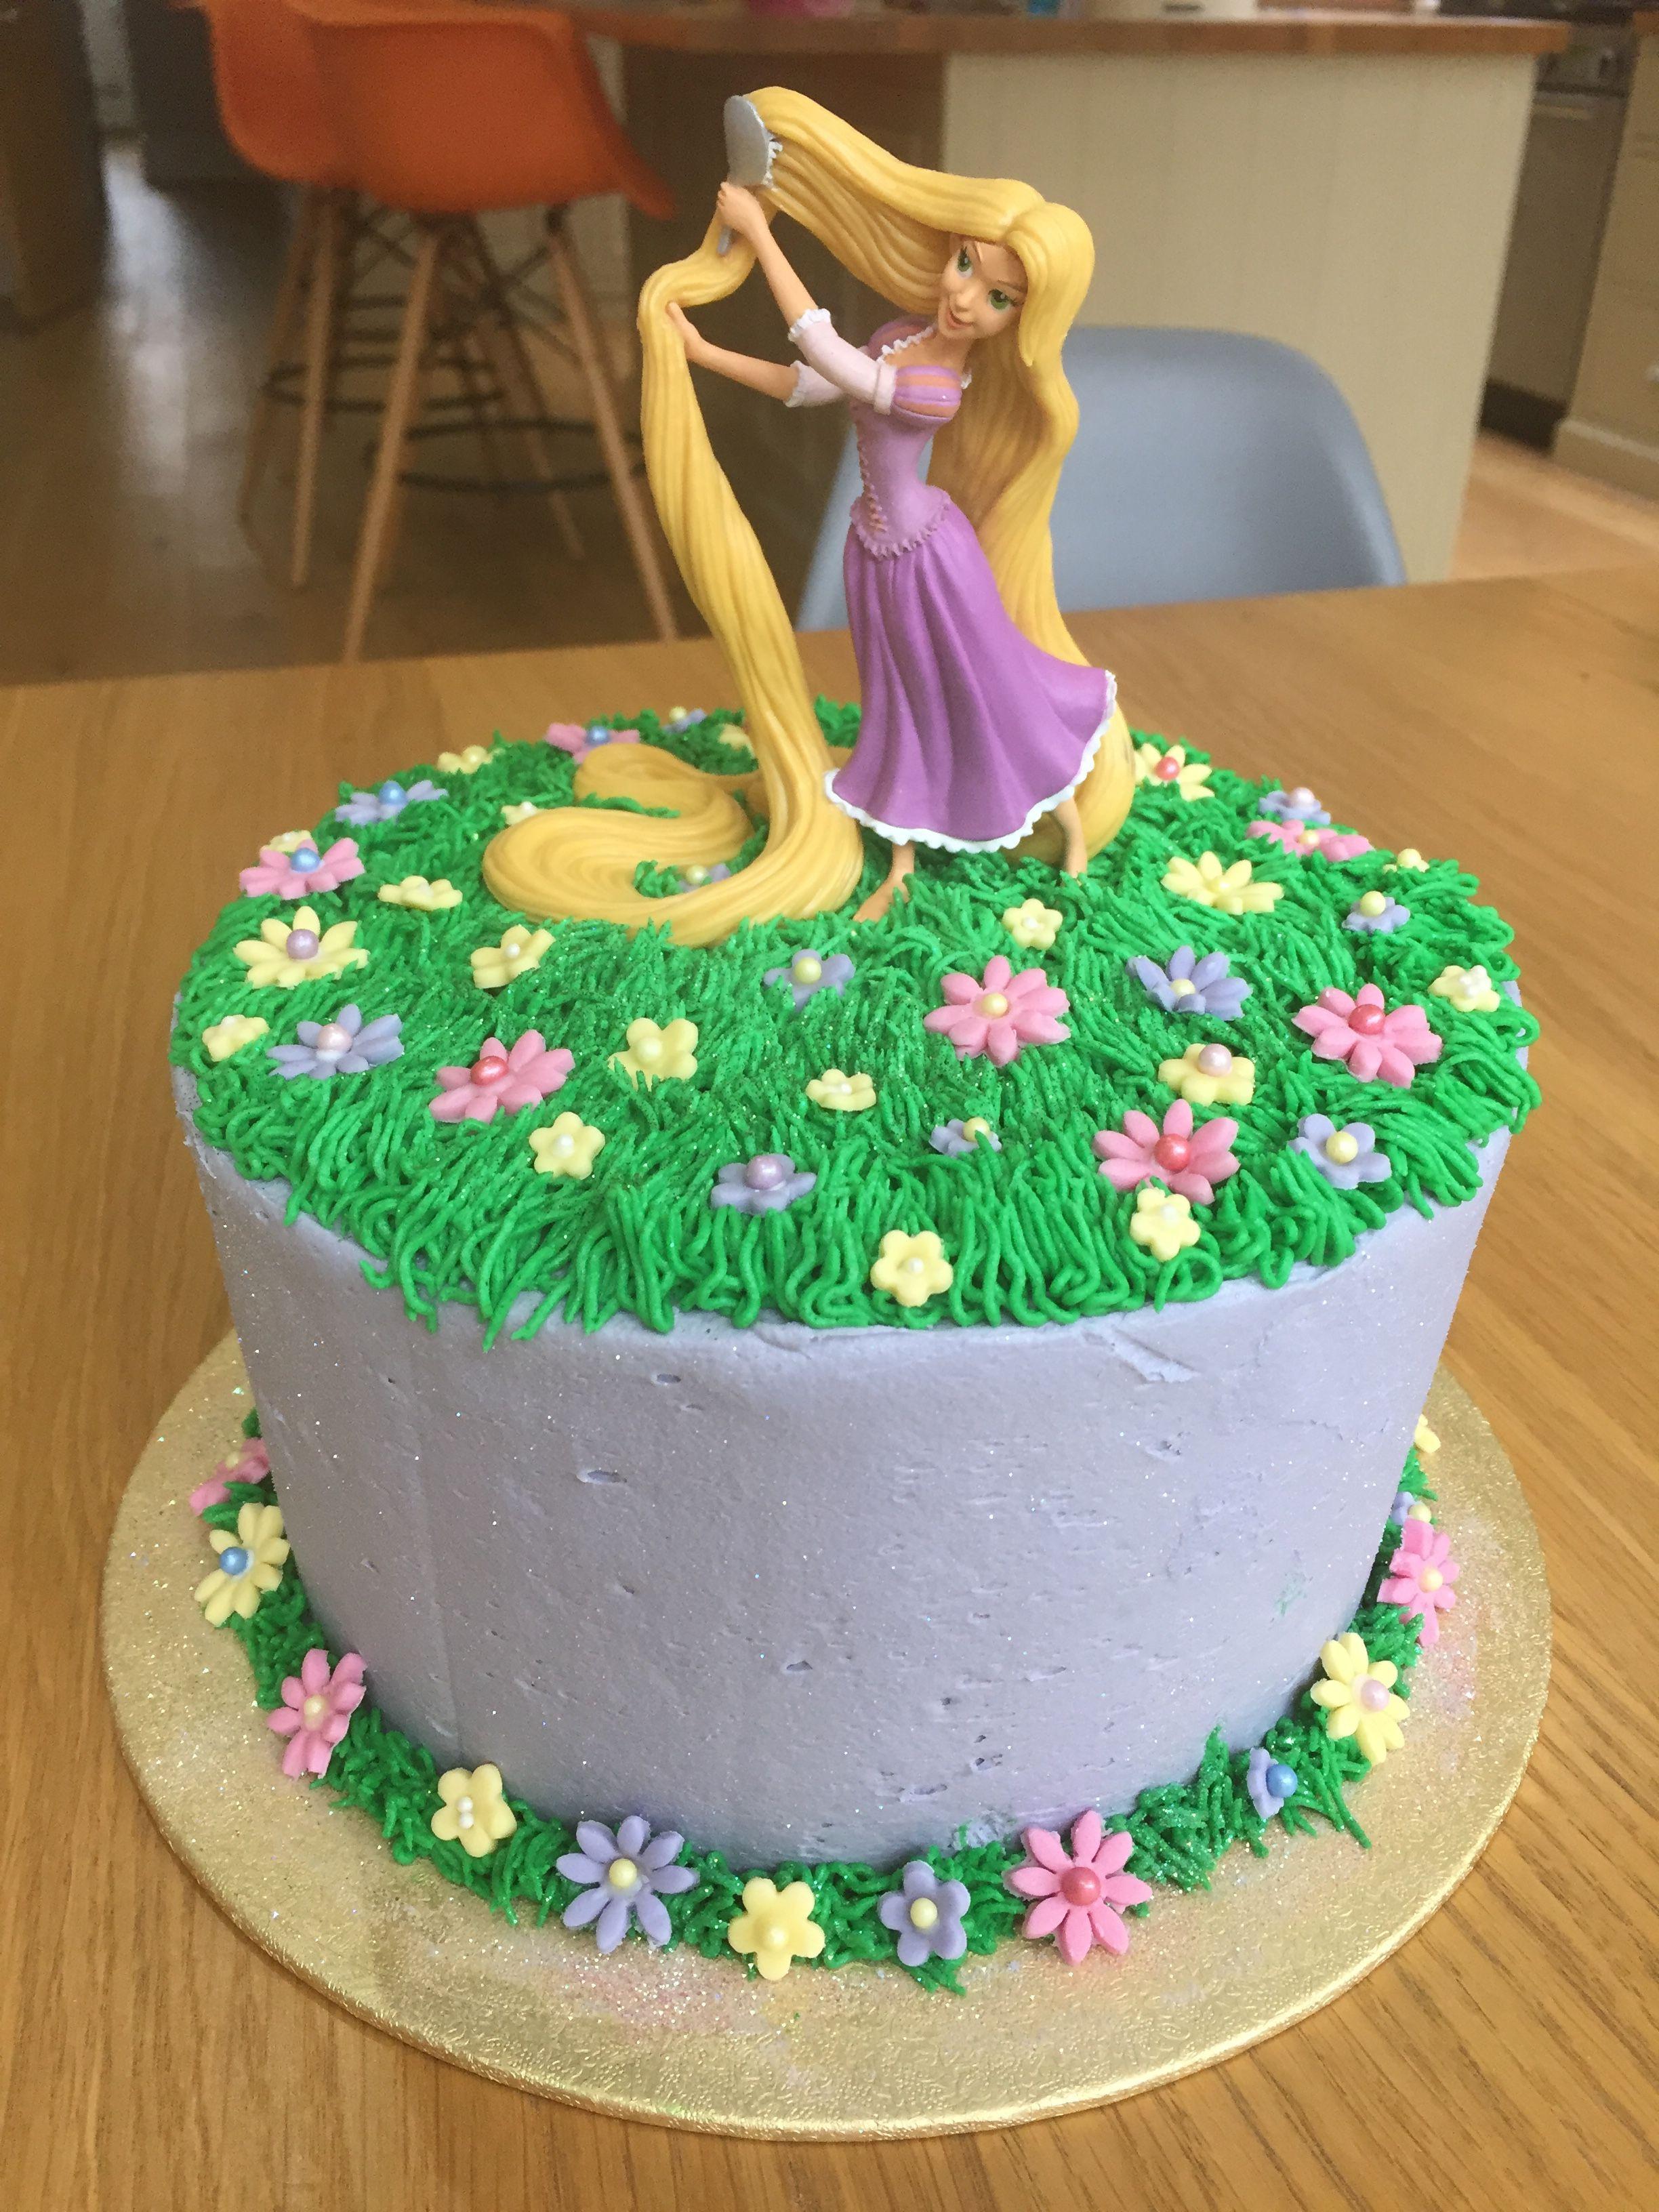 Best ideas about Rapunzel Birthday Cake . Save or Pin Rapunzel birthday cake cakes in 2019 Now.